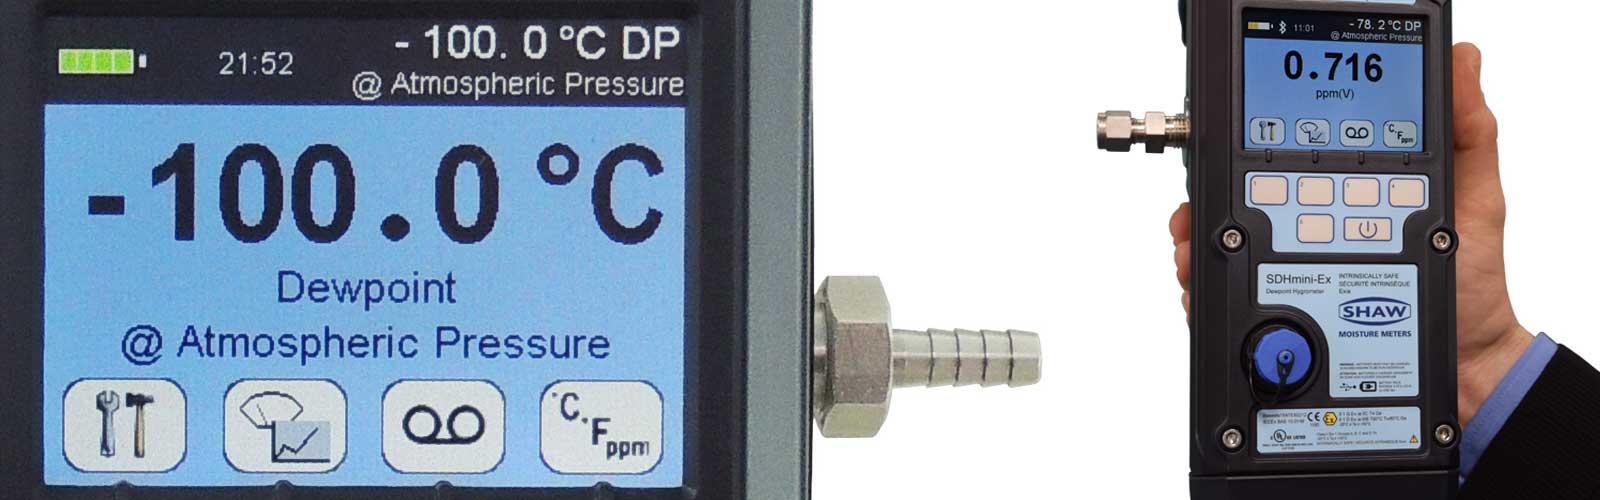 intrinsically safe hand held dewpoint meter SDHmini-Ex hygrometer